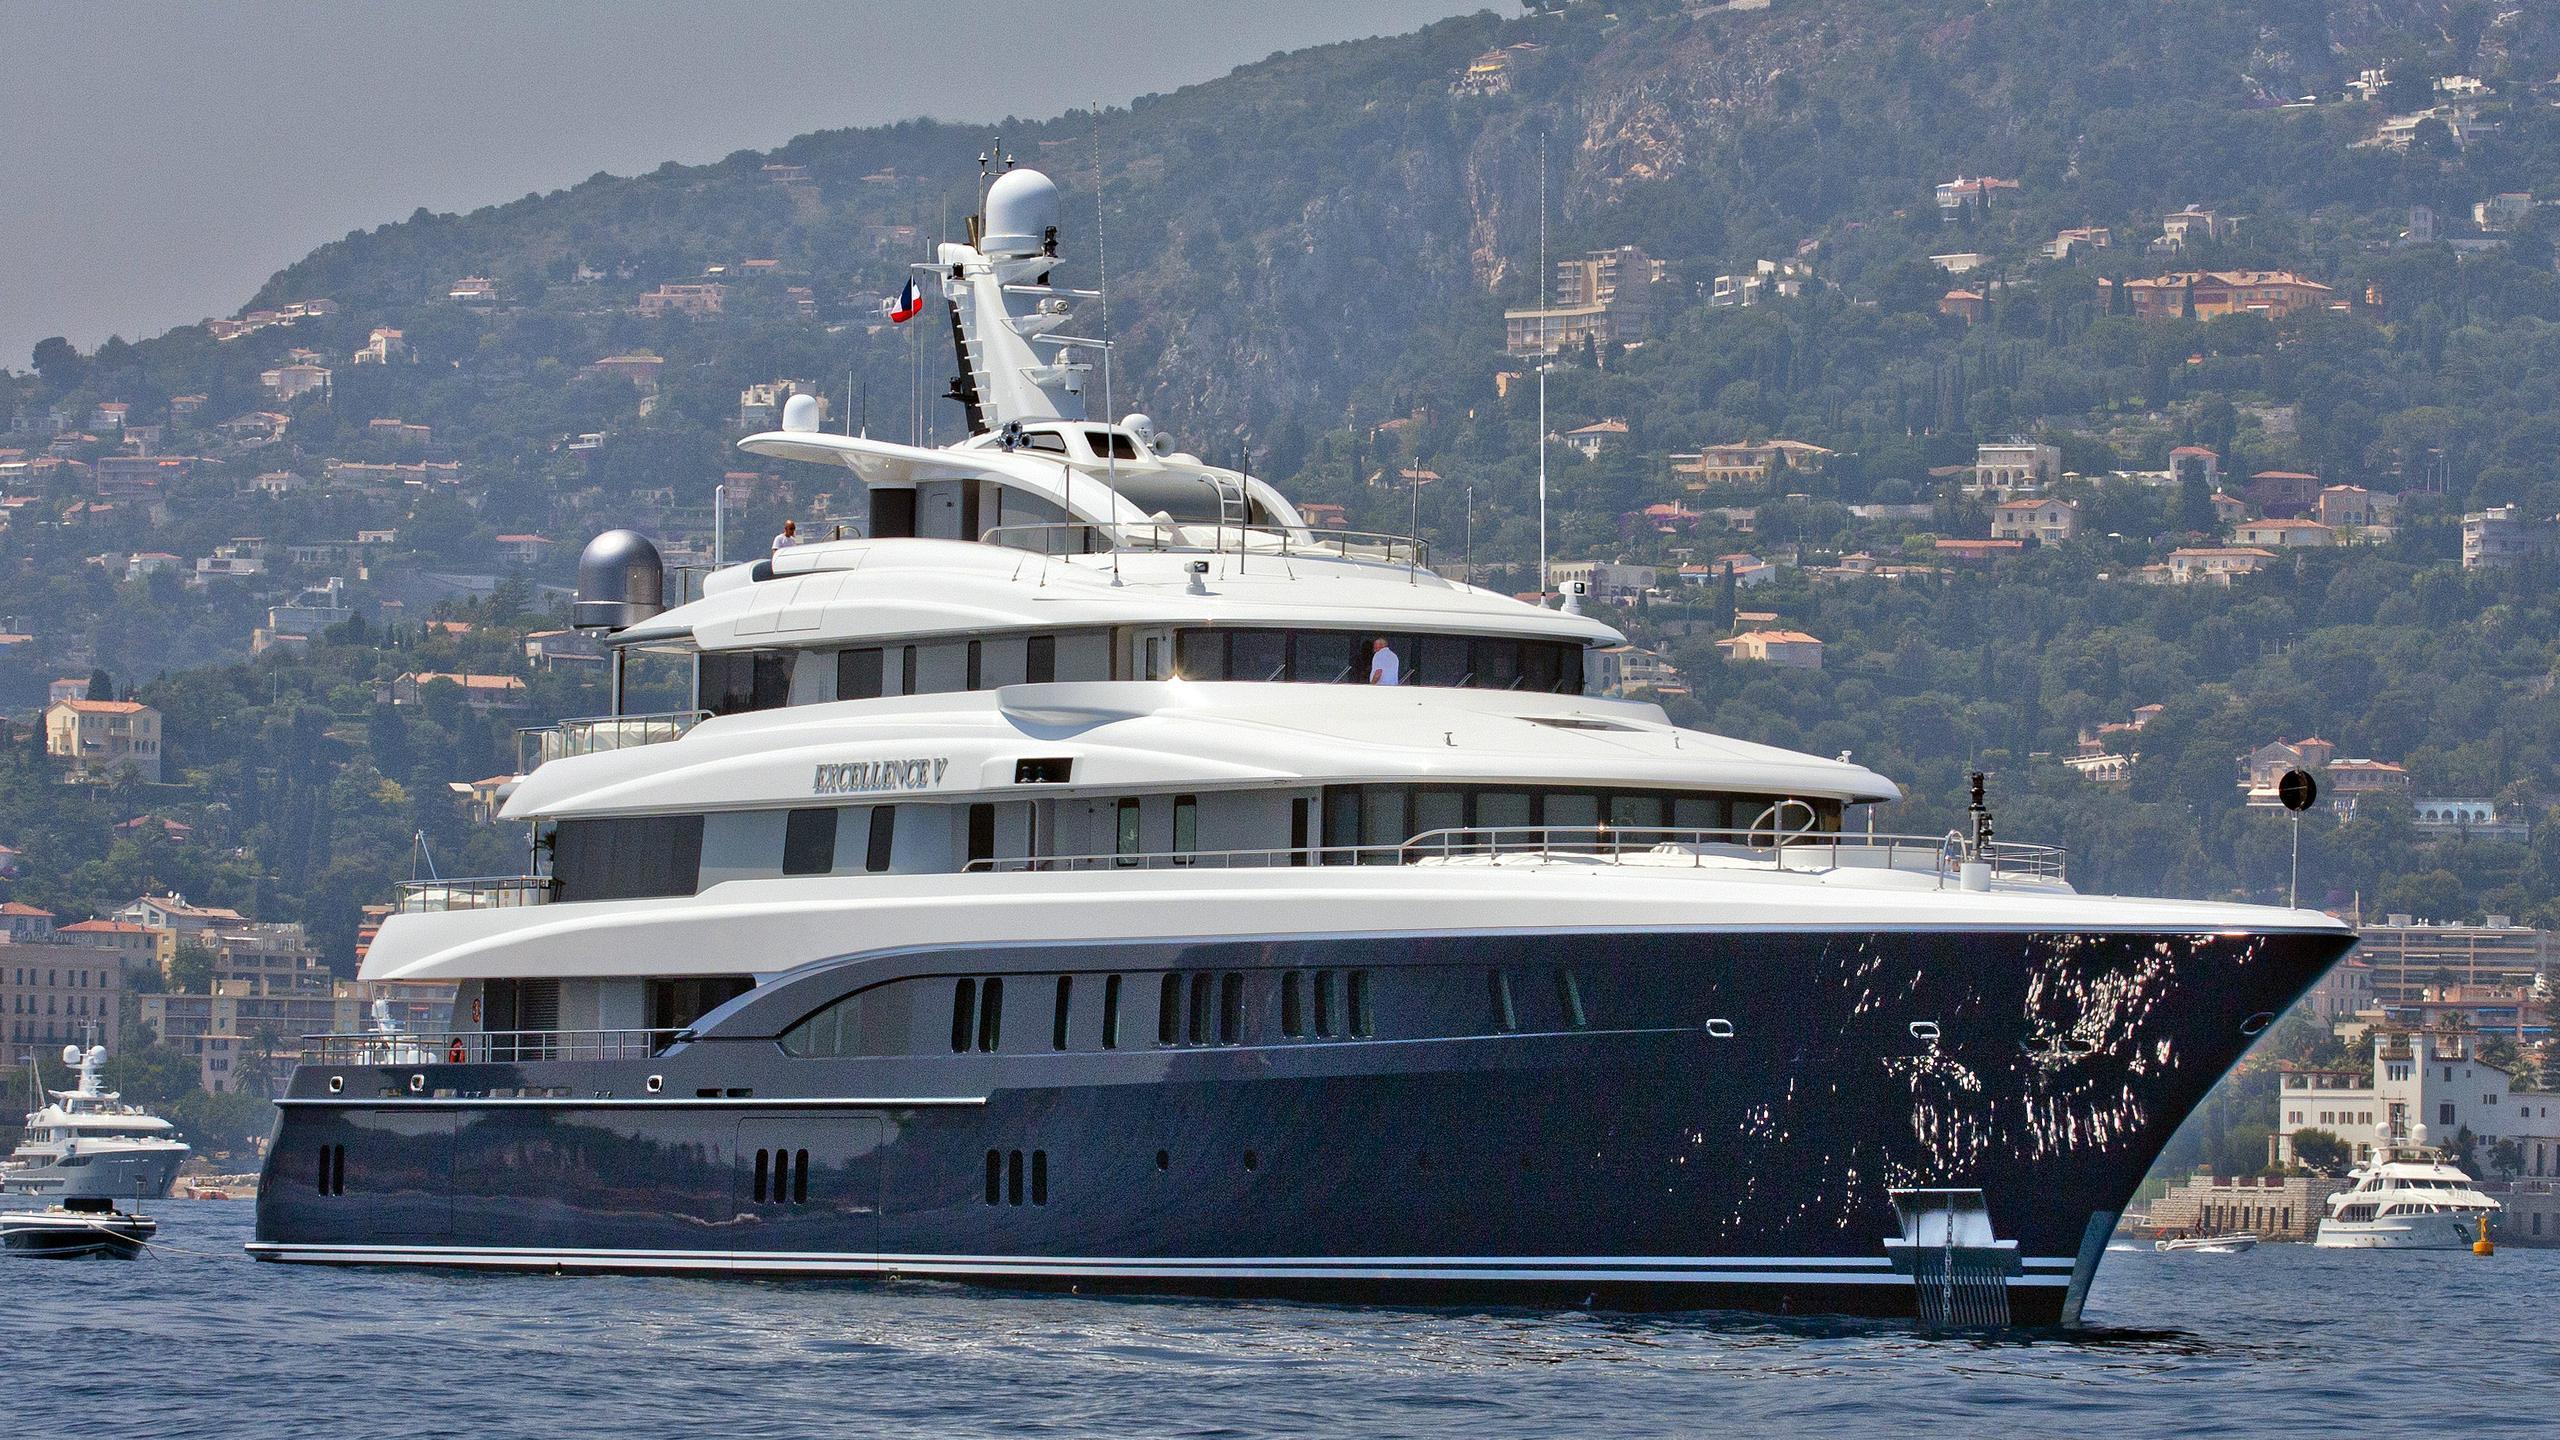 Excellence-V-motor-yacht-abeking-rasmussen-2012-60m-profile